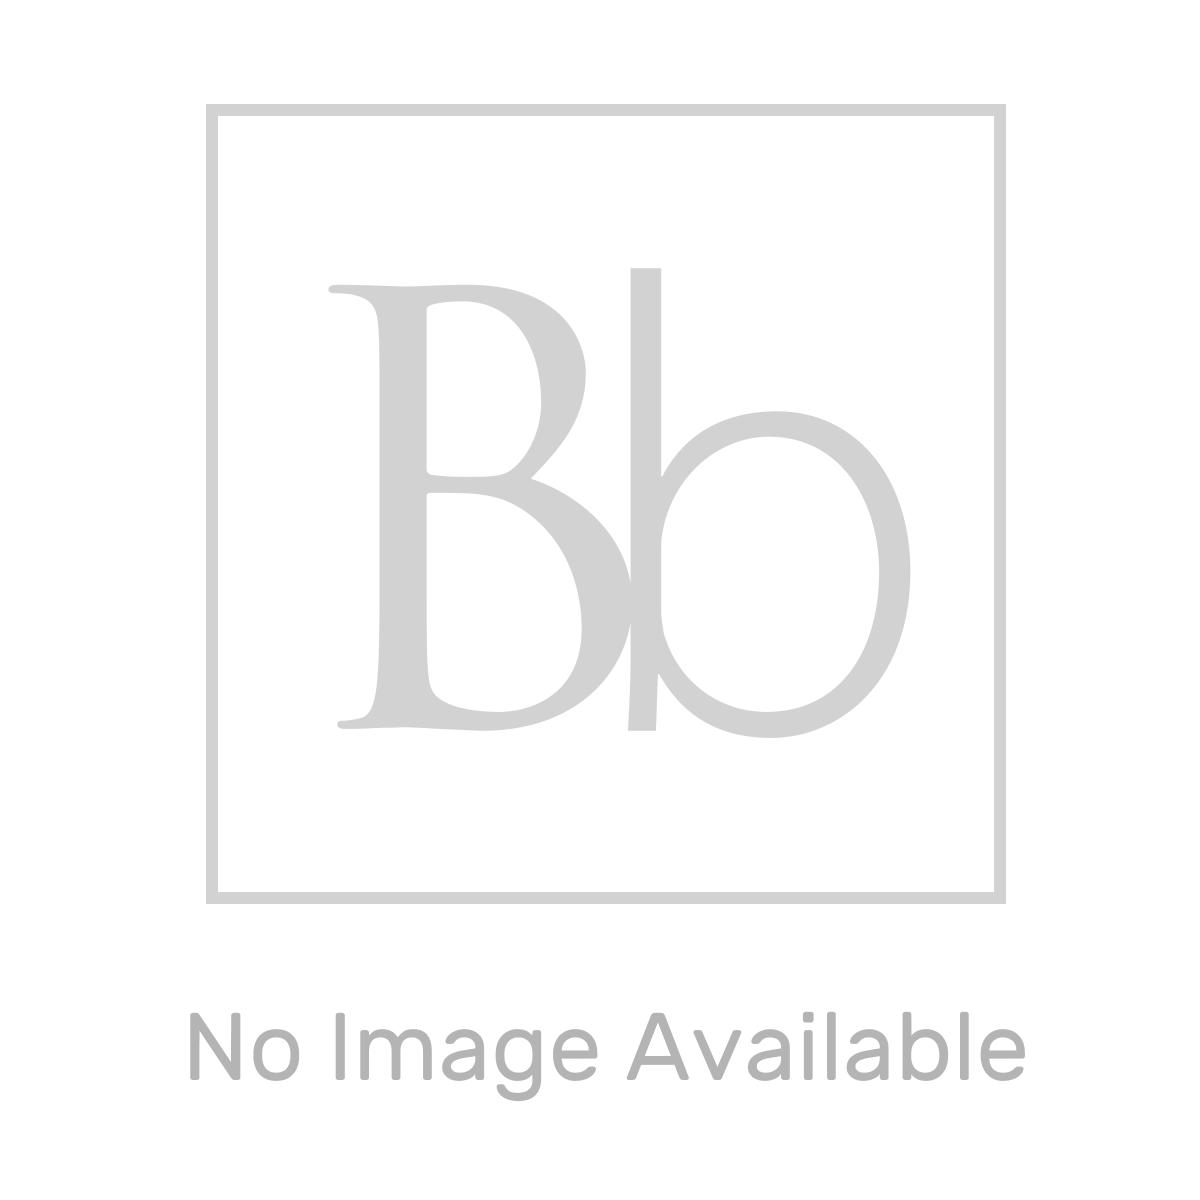 RAK Washington Grey Bathroom Mirror 650mm Measurements